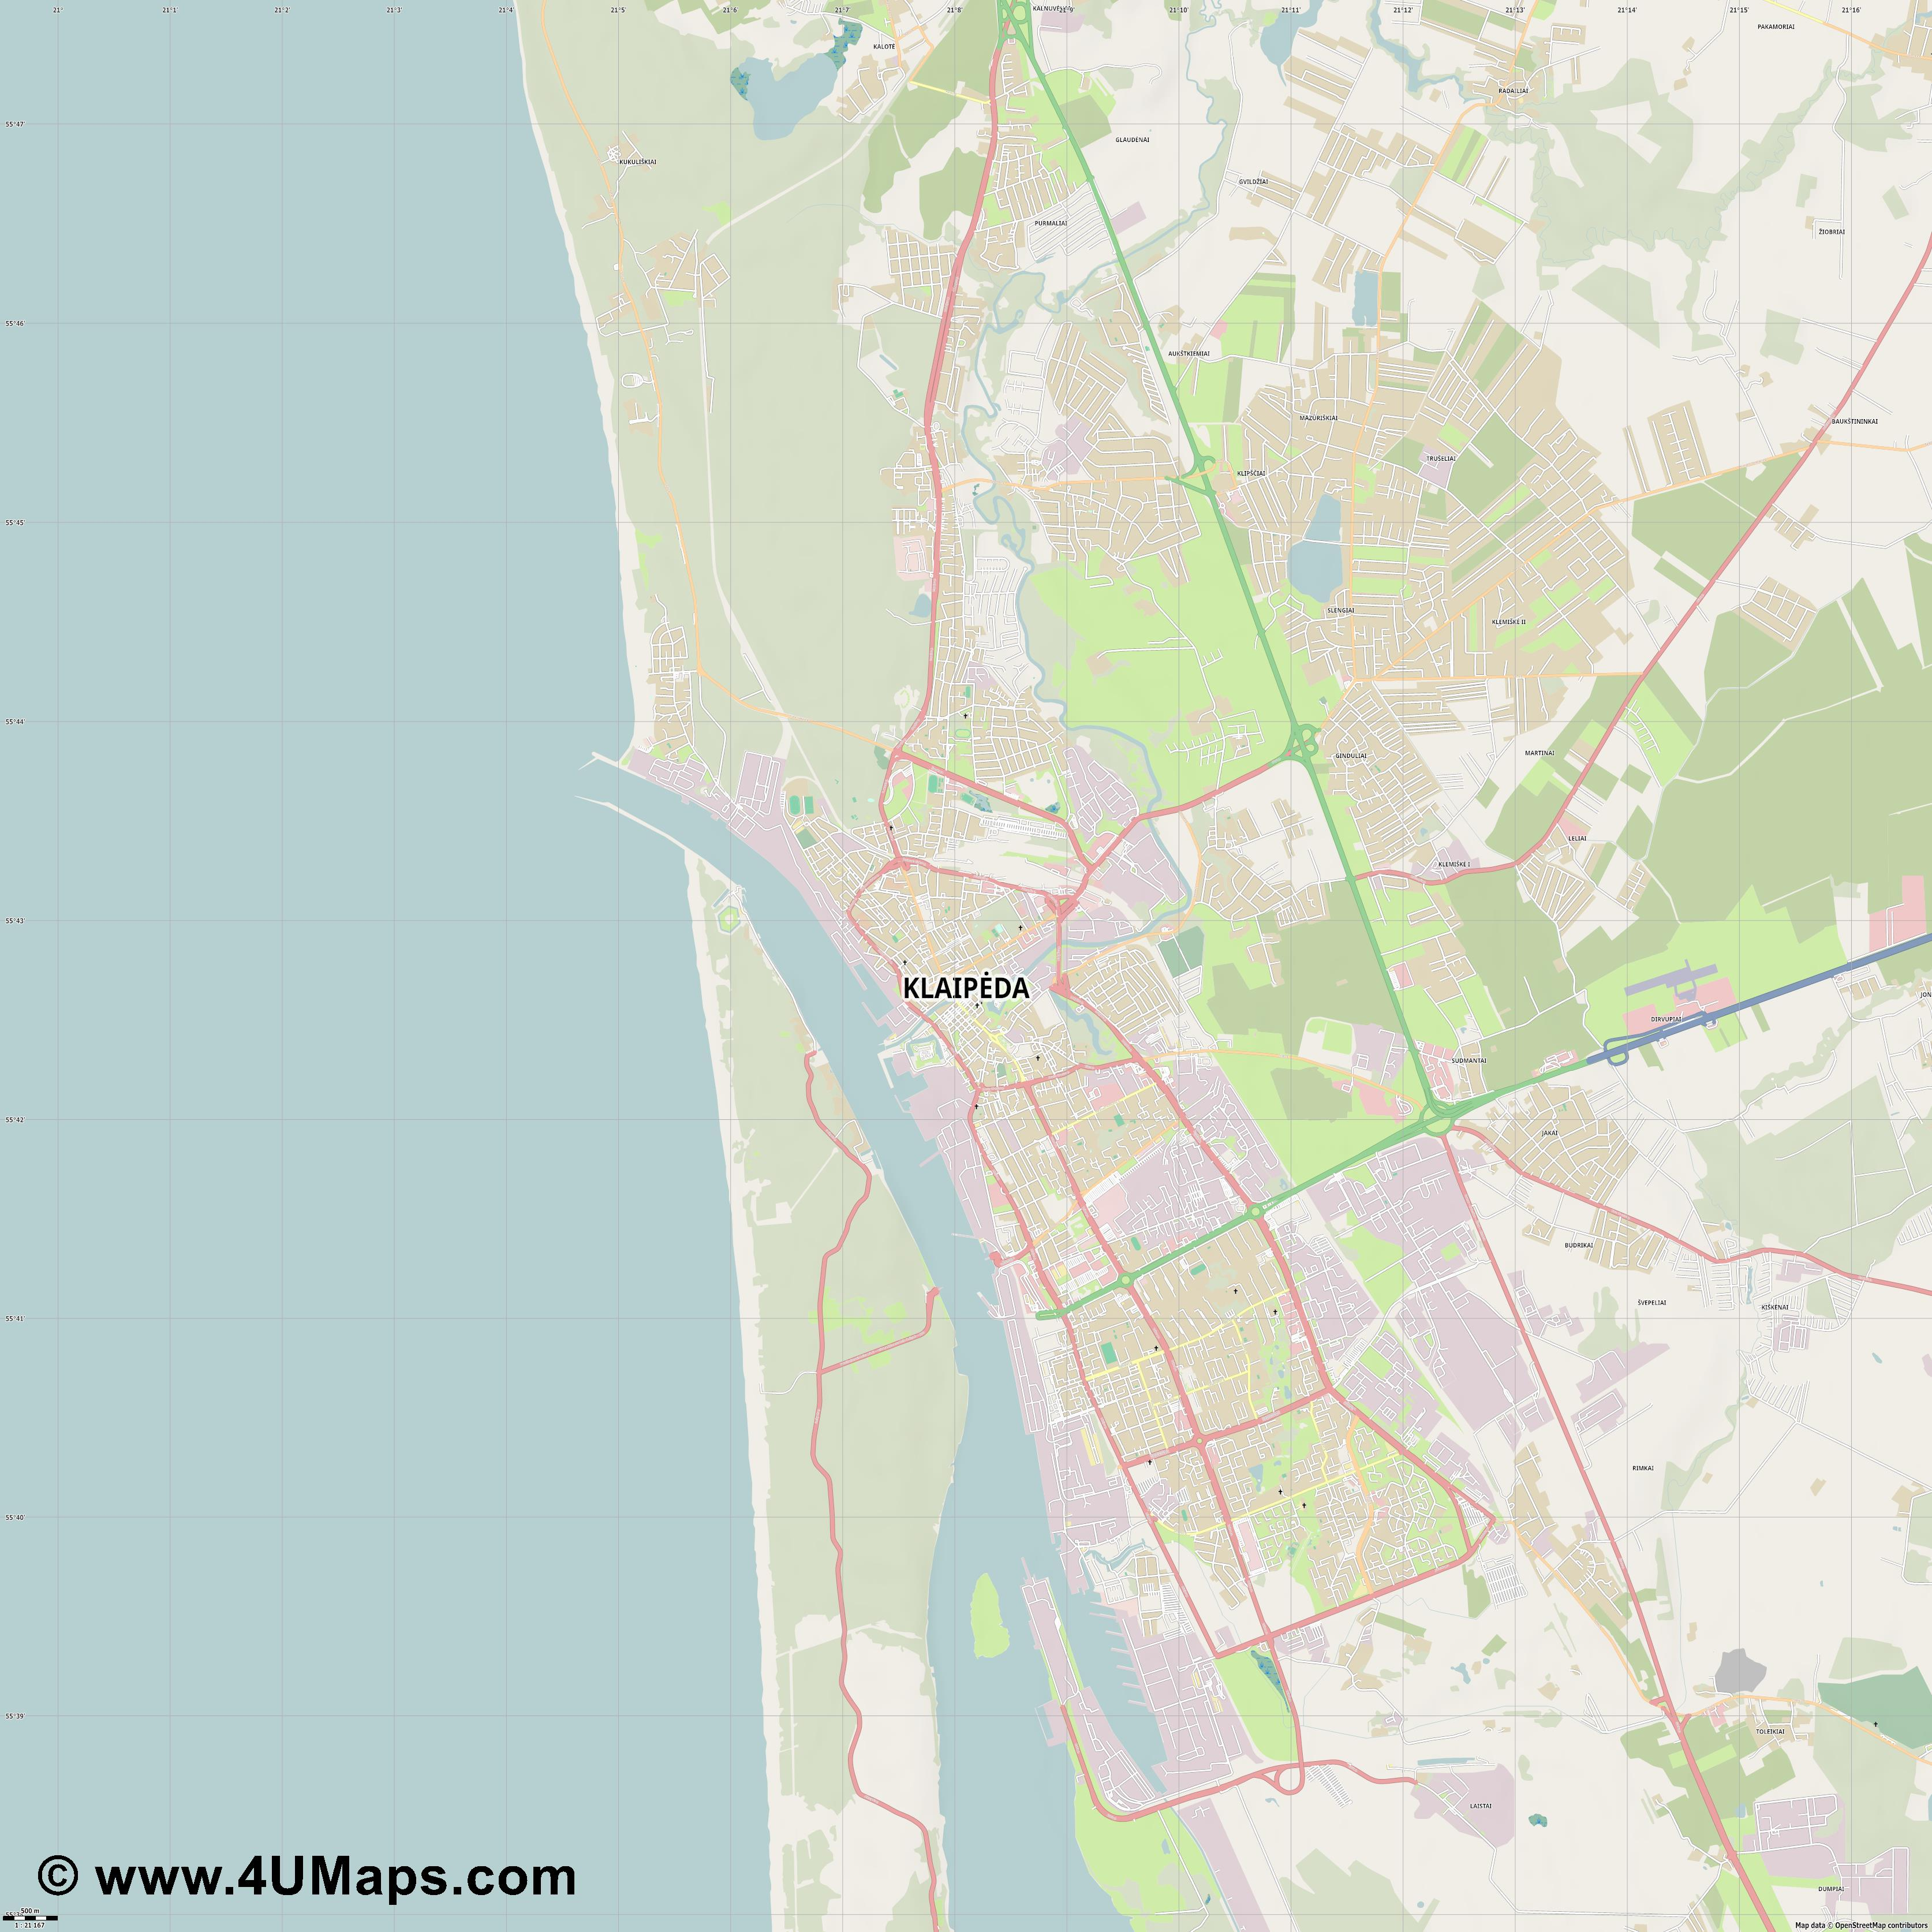 Svg Scalable Vector City Map Klaipėda - Klaipėda map